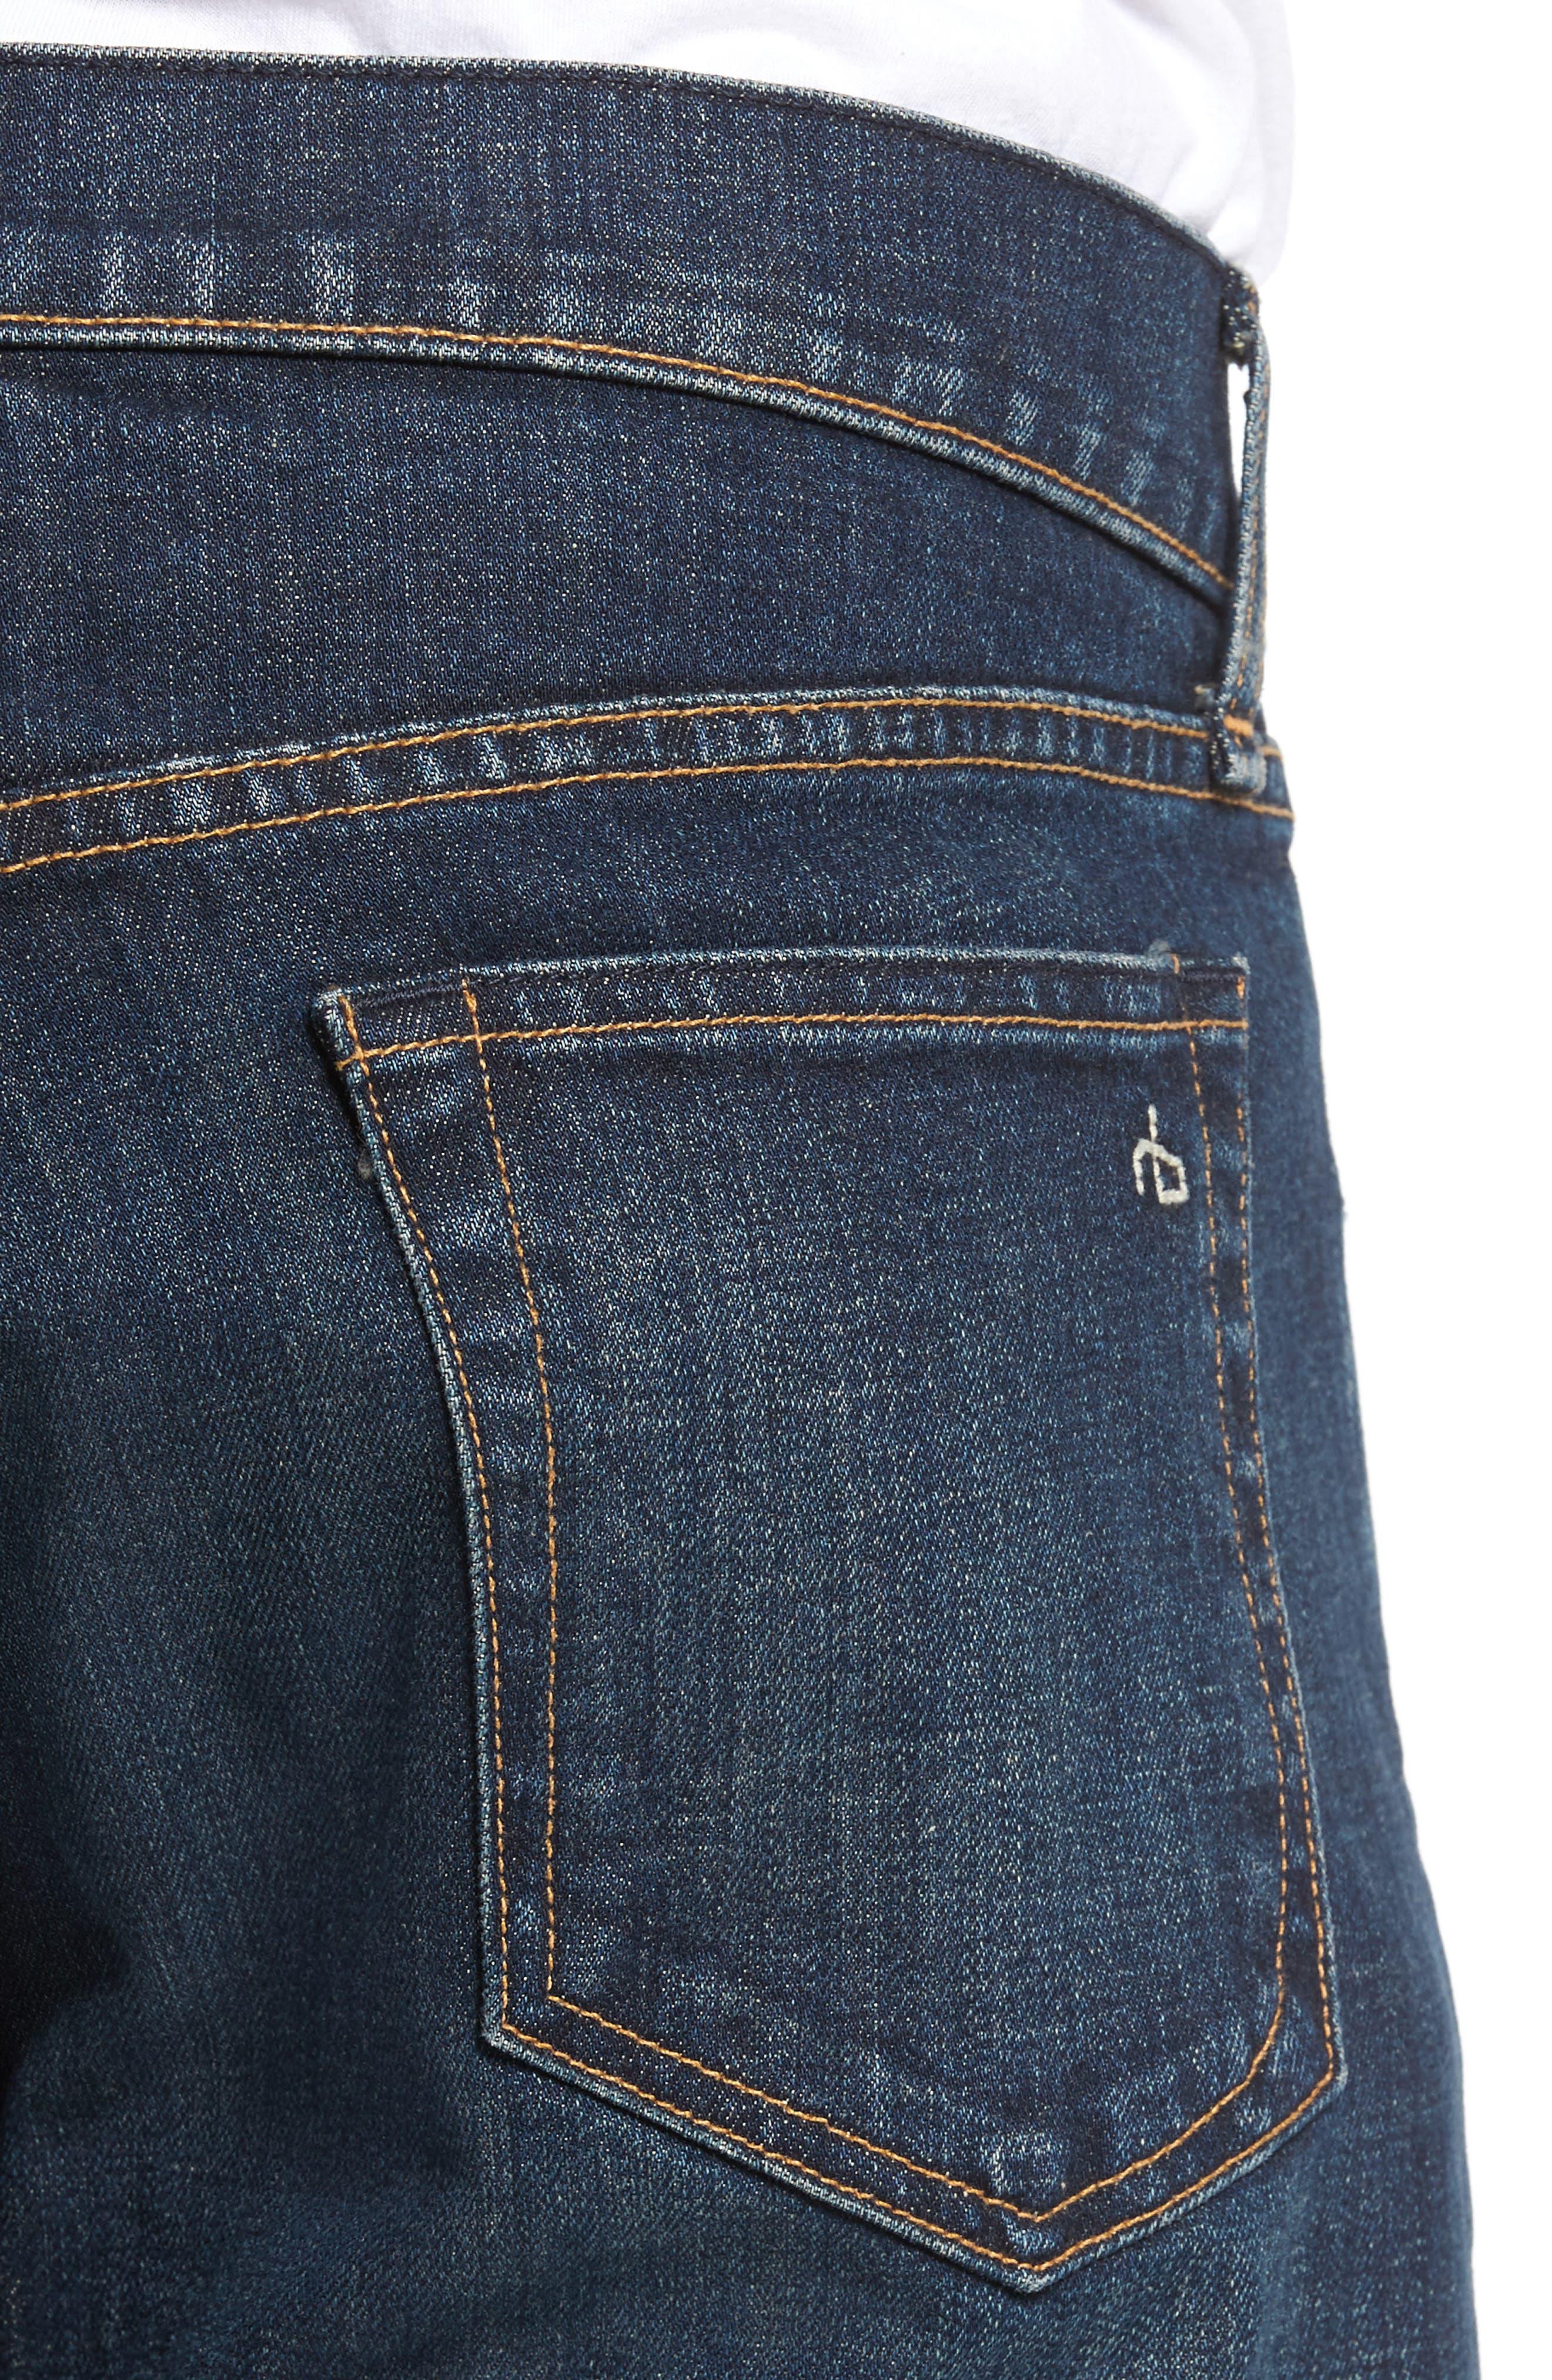 Fit 3 Slim Straight Leg Jeans,                             Alternate thumbnail 4, color,                             404